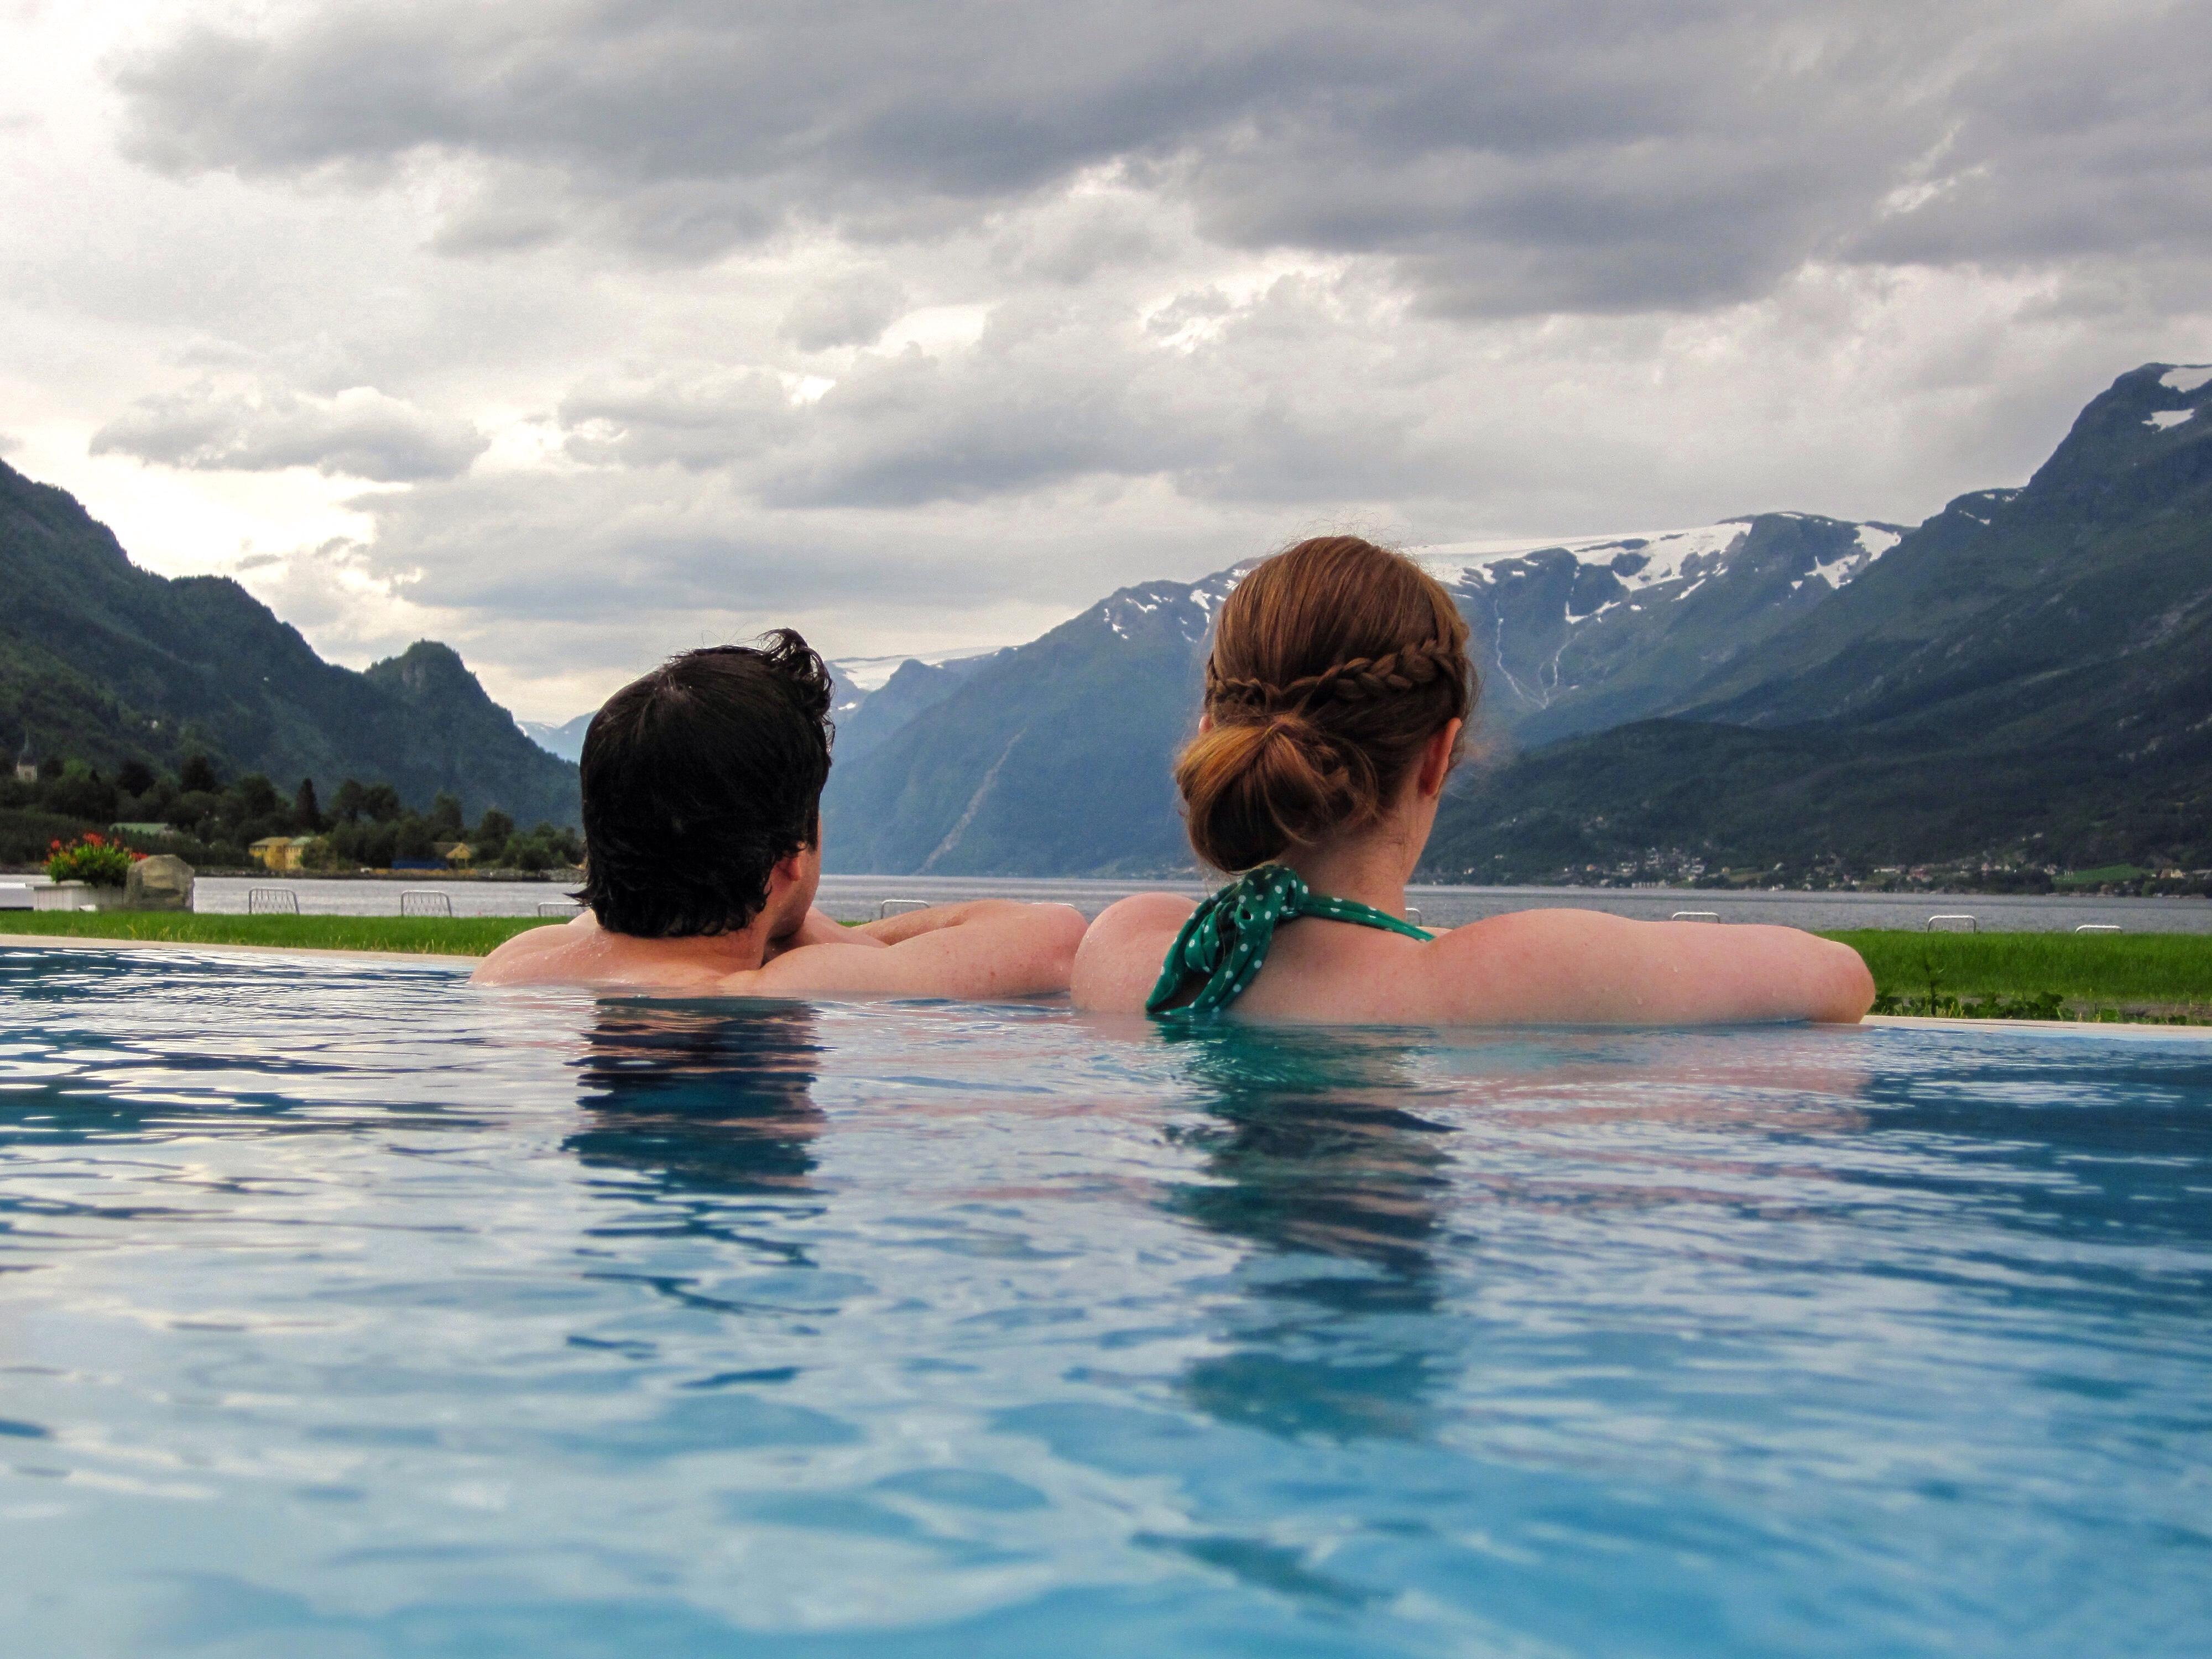 julieweiss10_Foap-Watching_the_summer_storm_in_Norway_